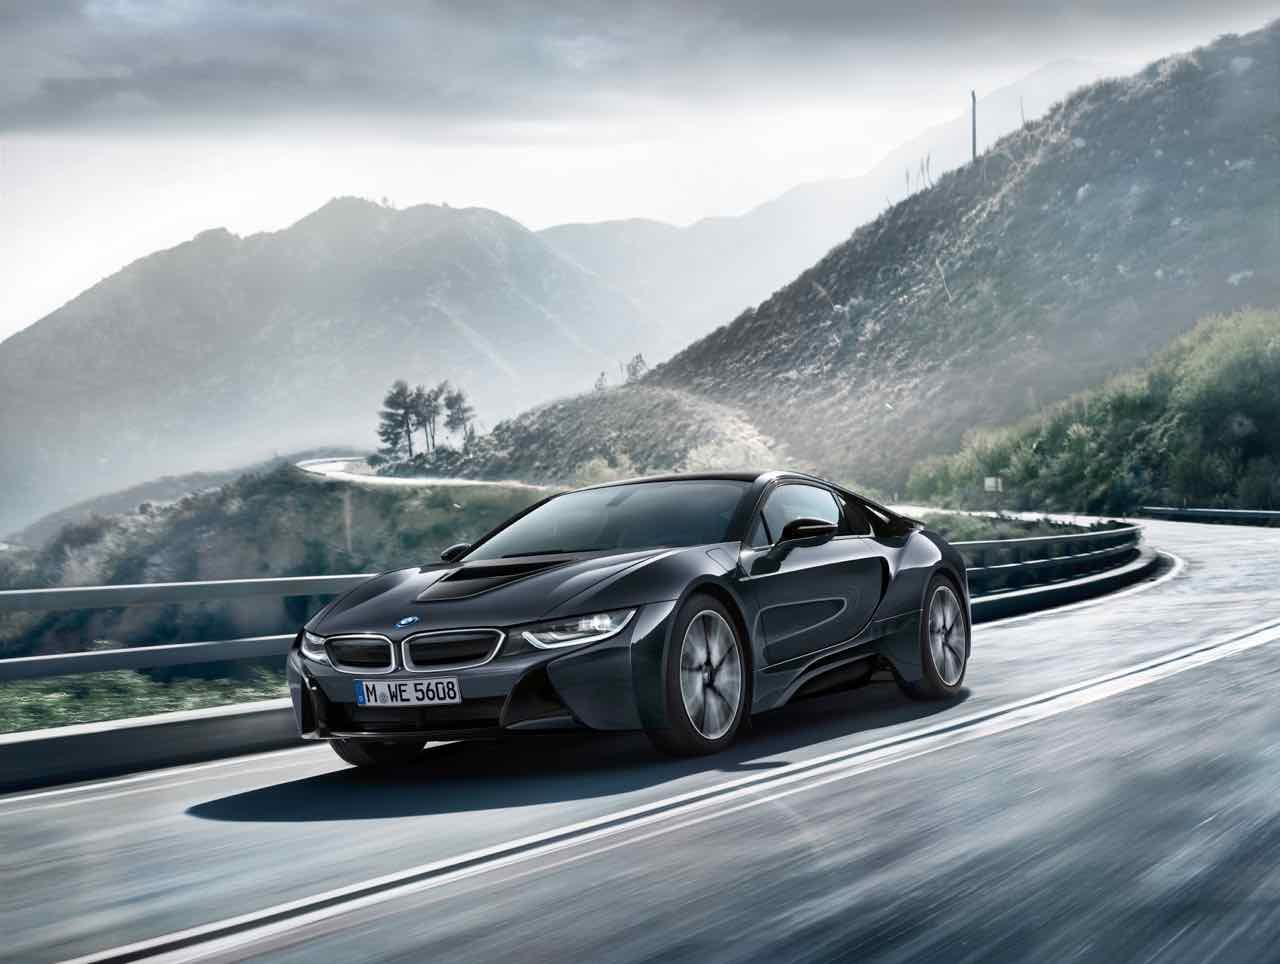 BMW i8 Protonic Dark Silver Edition 2016 – 1